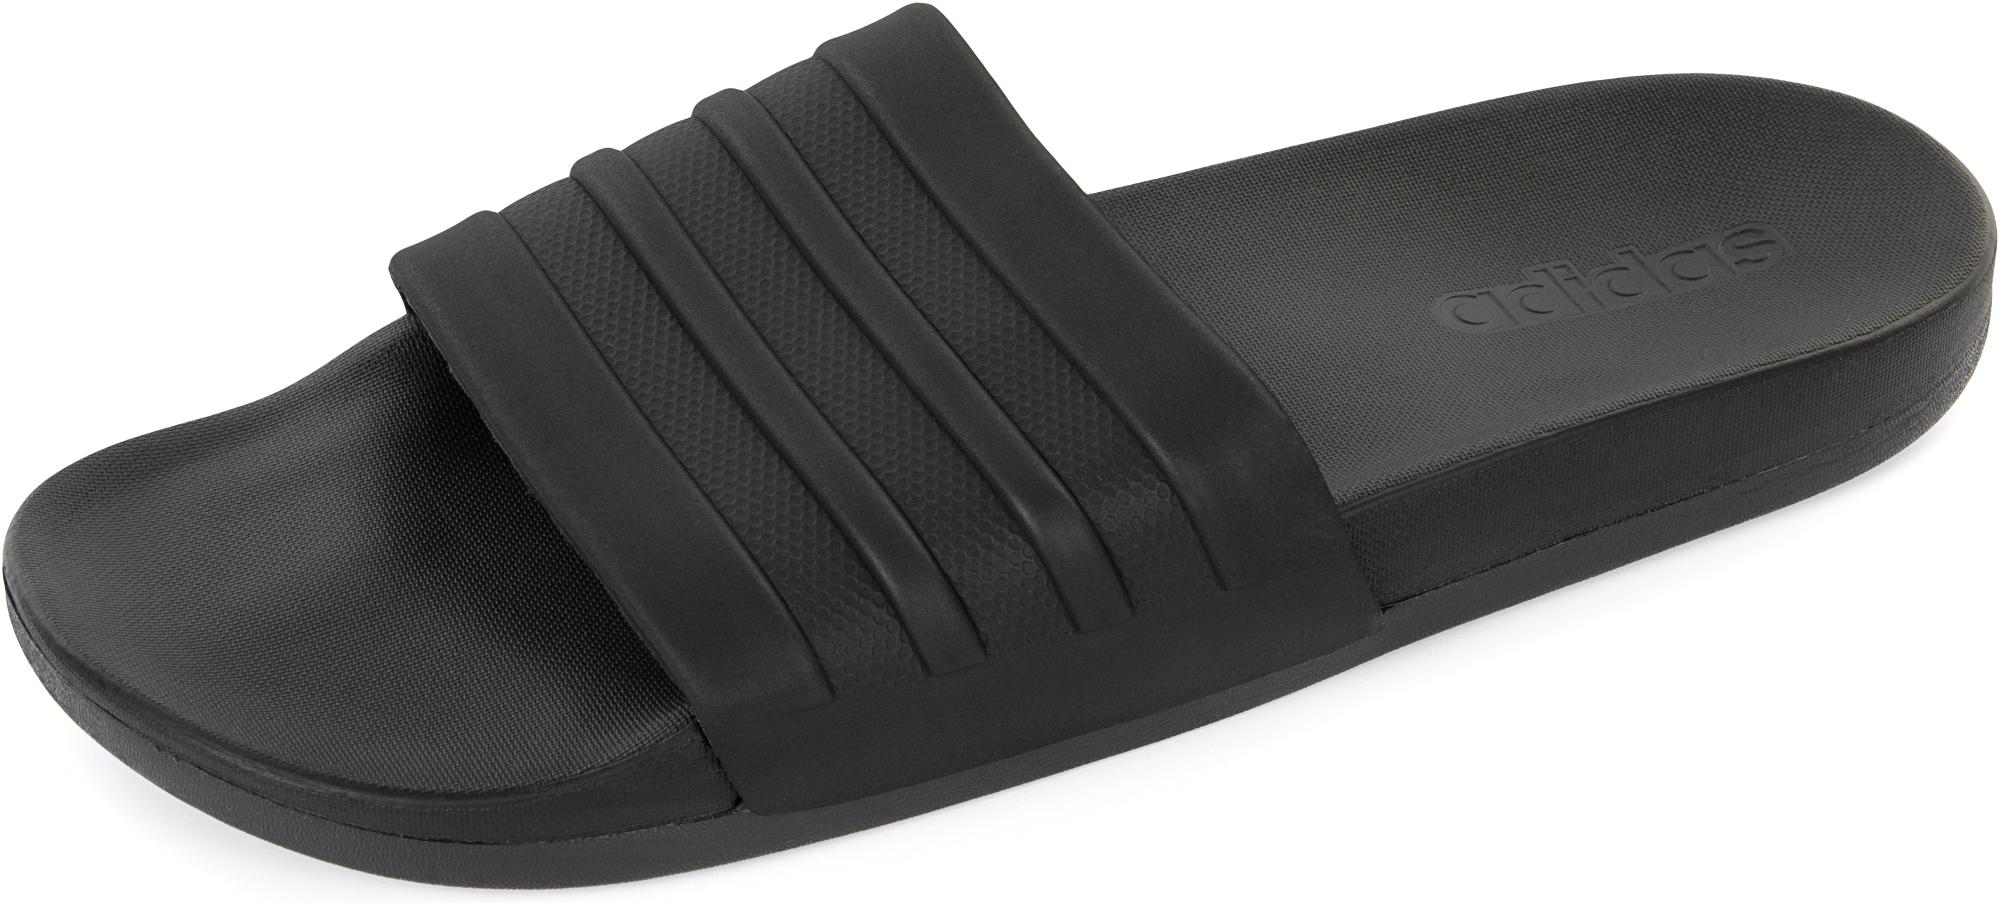 Adidas Шлепанцы мужские Adidas Adilette Comfort, размер 46 цена в Москве и Питере